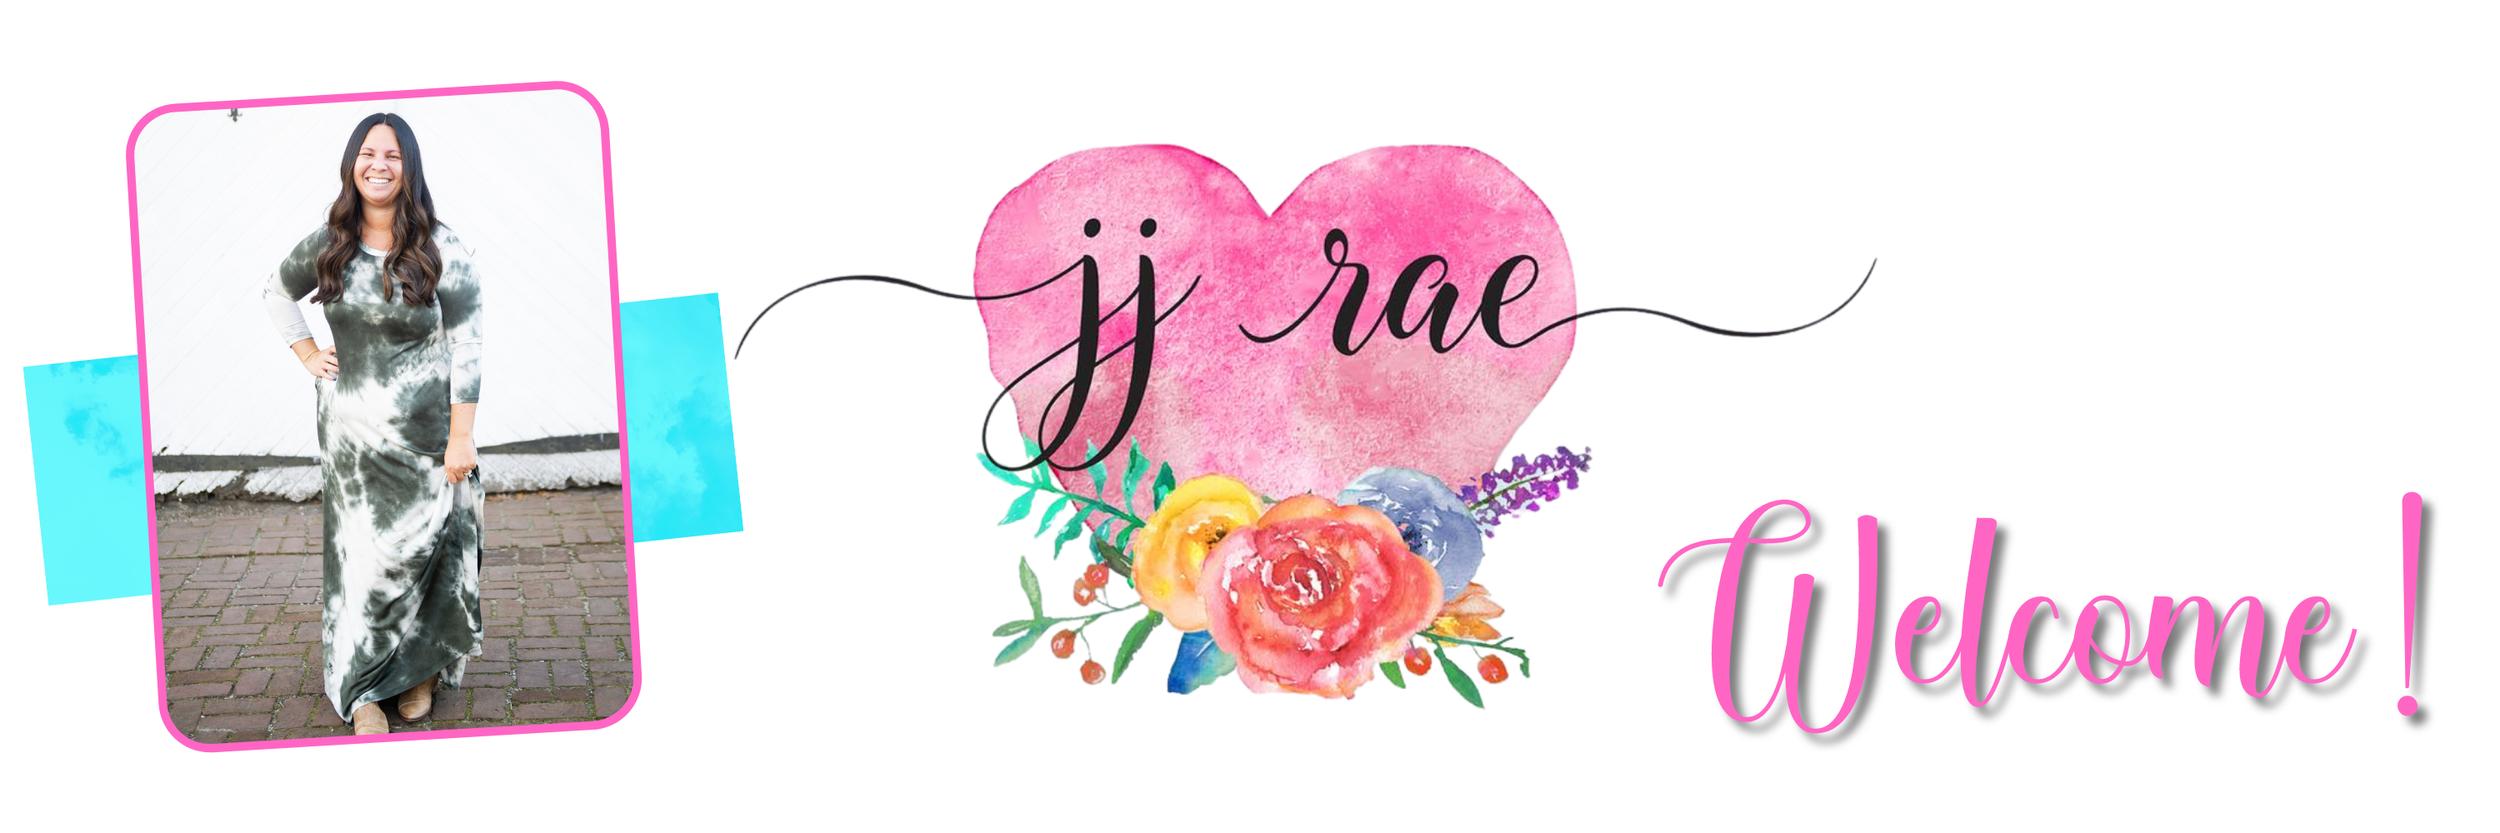 JJ Rae Women's Online Fashion Boutique May Shopping